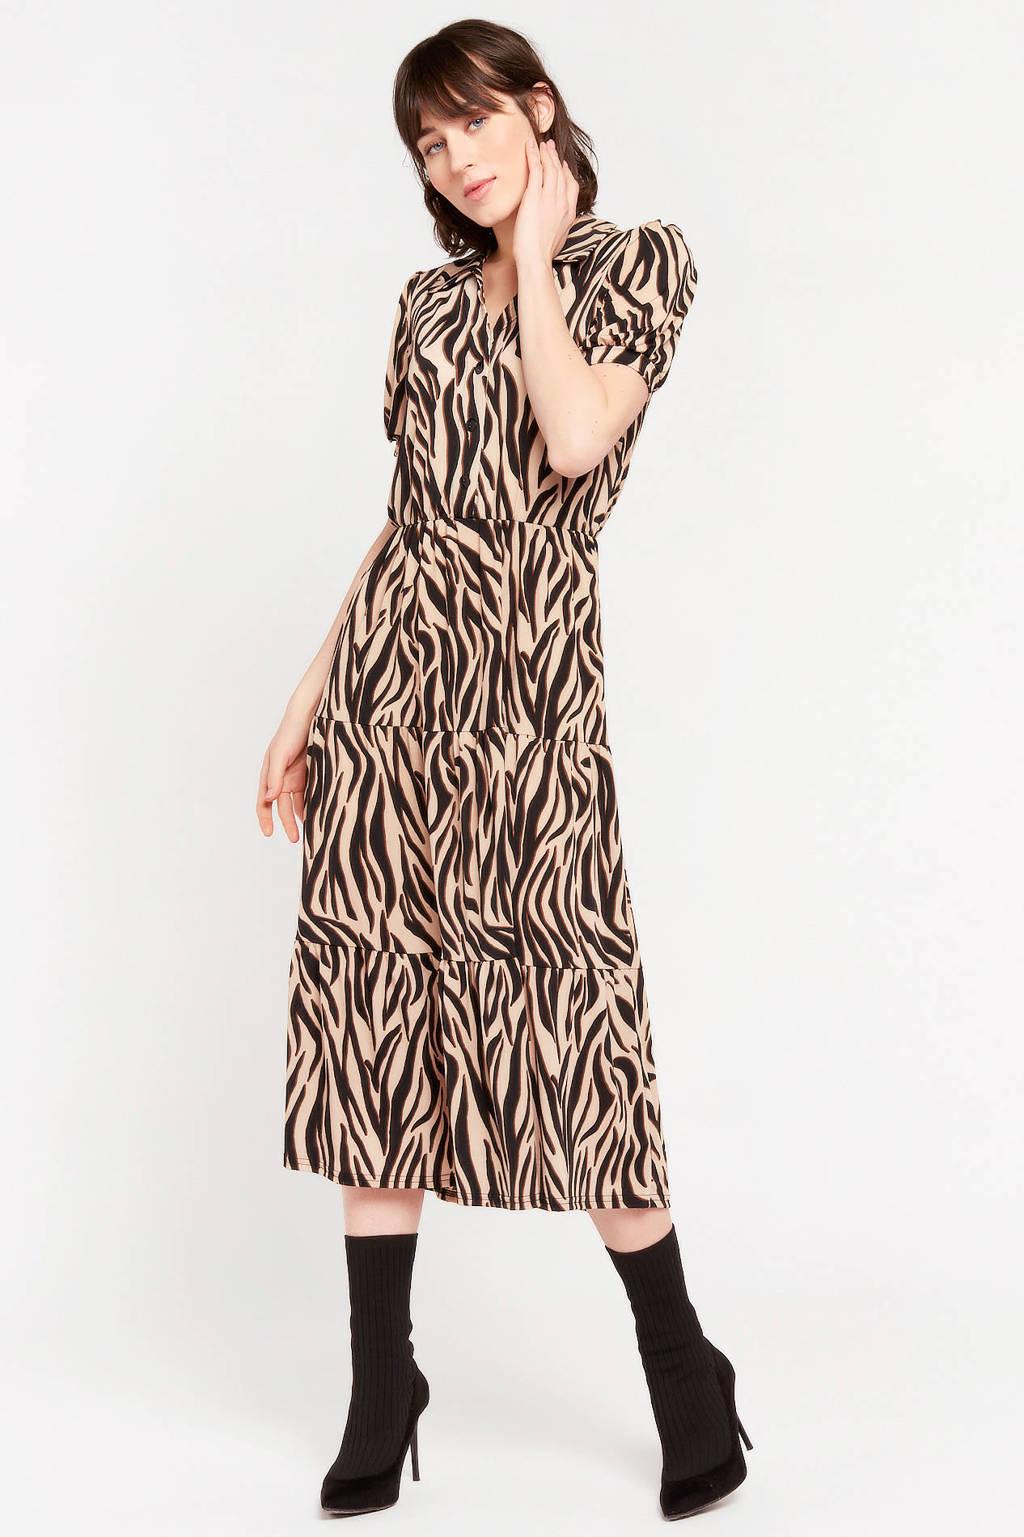 LOLALIZA jurk met dierenprint zand, Zand